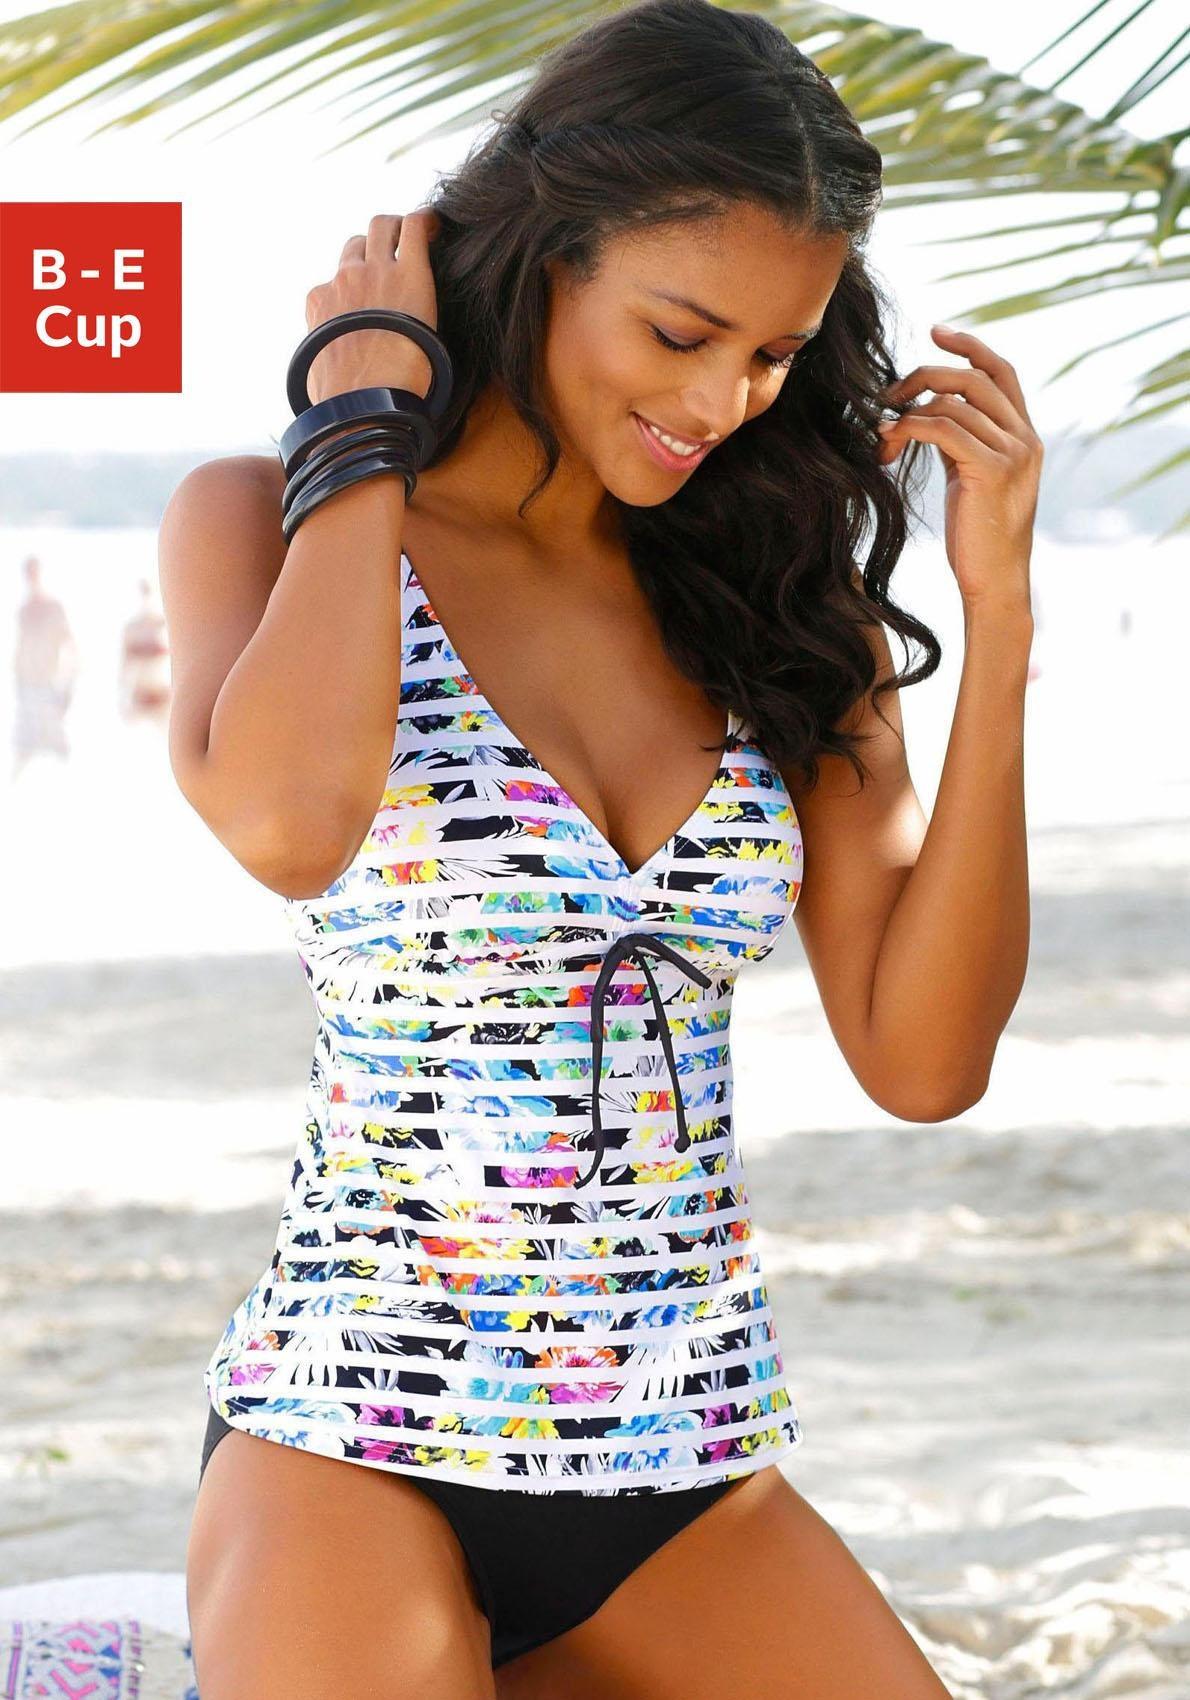 Bügel Bikini Sunseeker by Lascana Gr 44 Cup D Streifendesign NEU 48